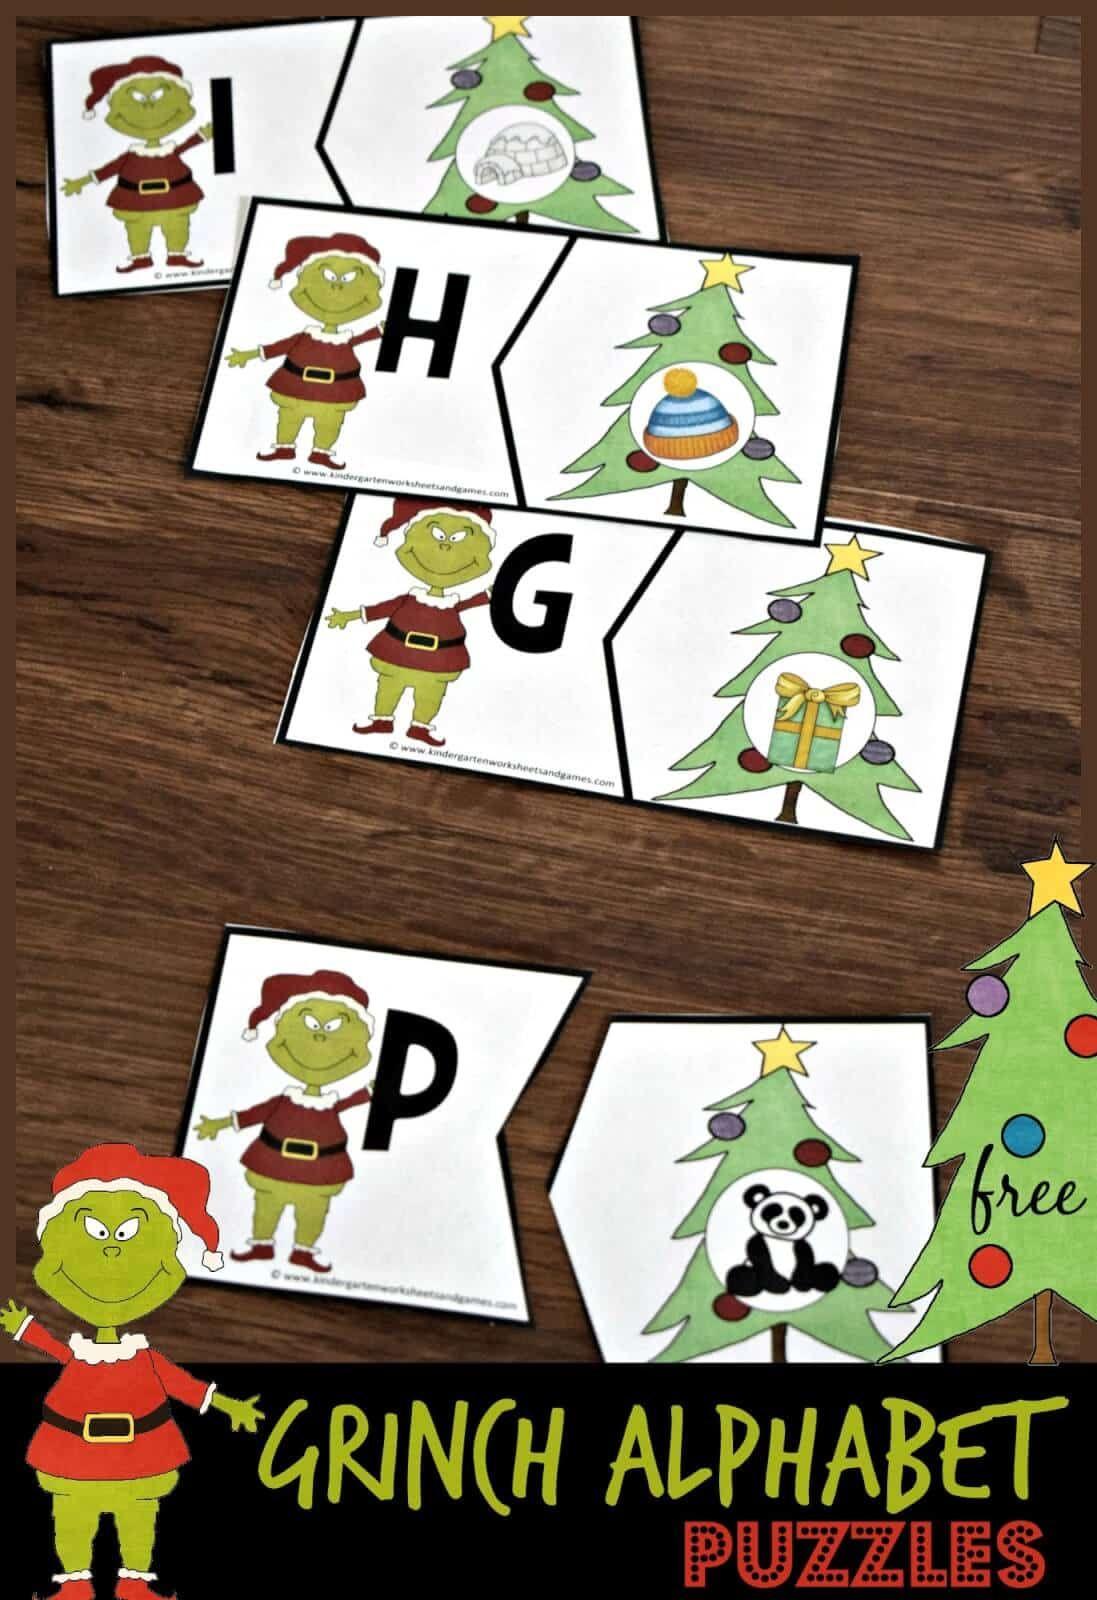 Grinch Alphabet Puzzles